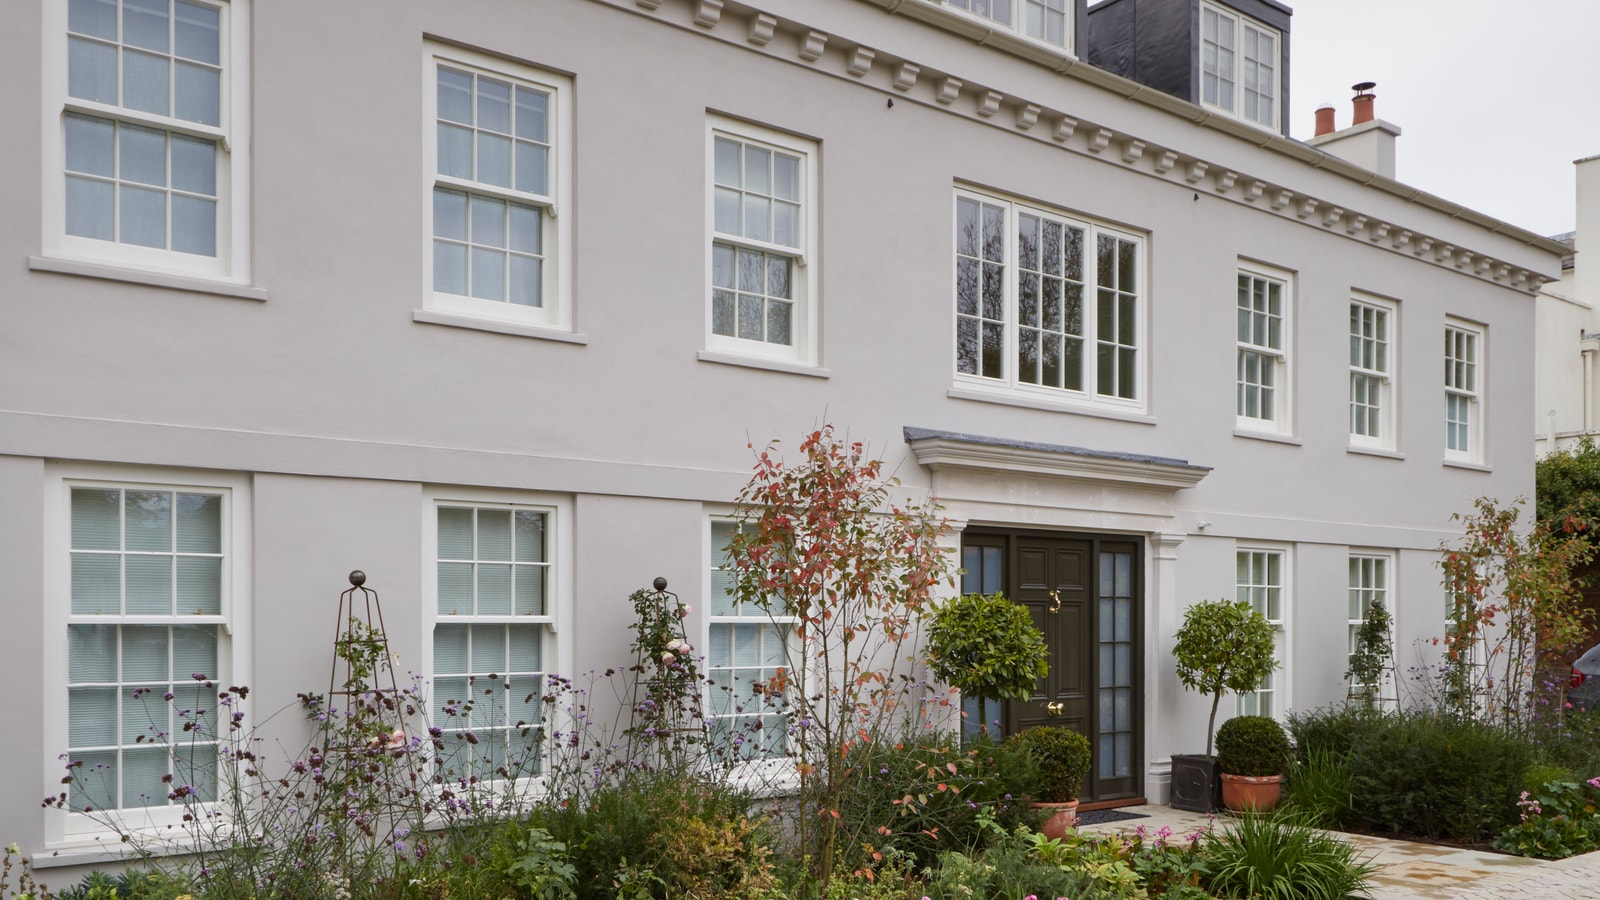 Property with Sound & Secure Extra Glazing Box Sash Windows